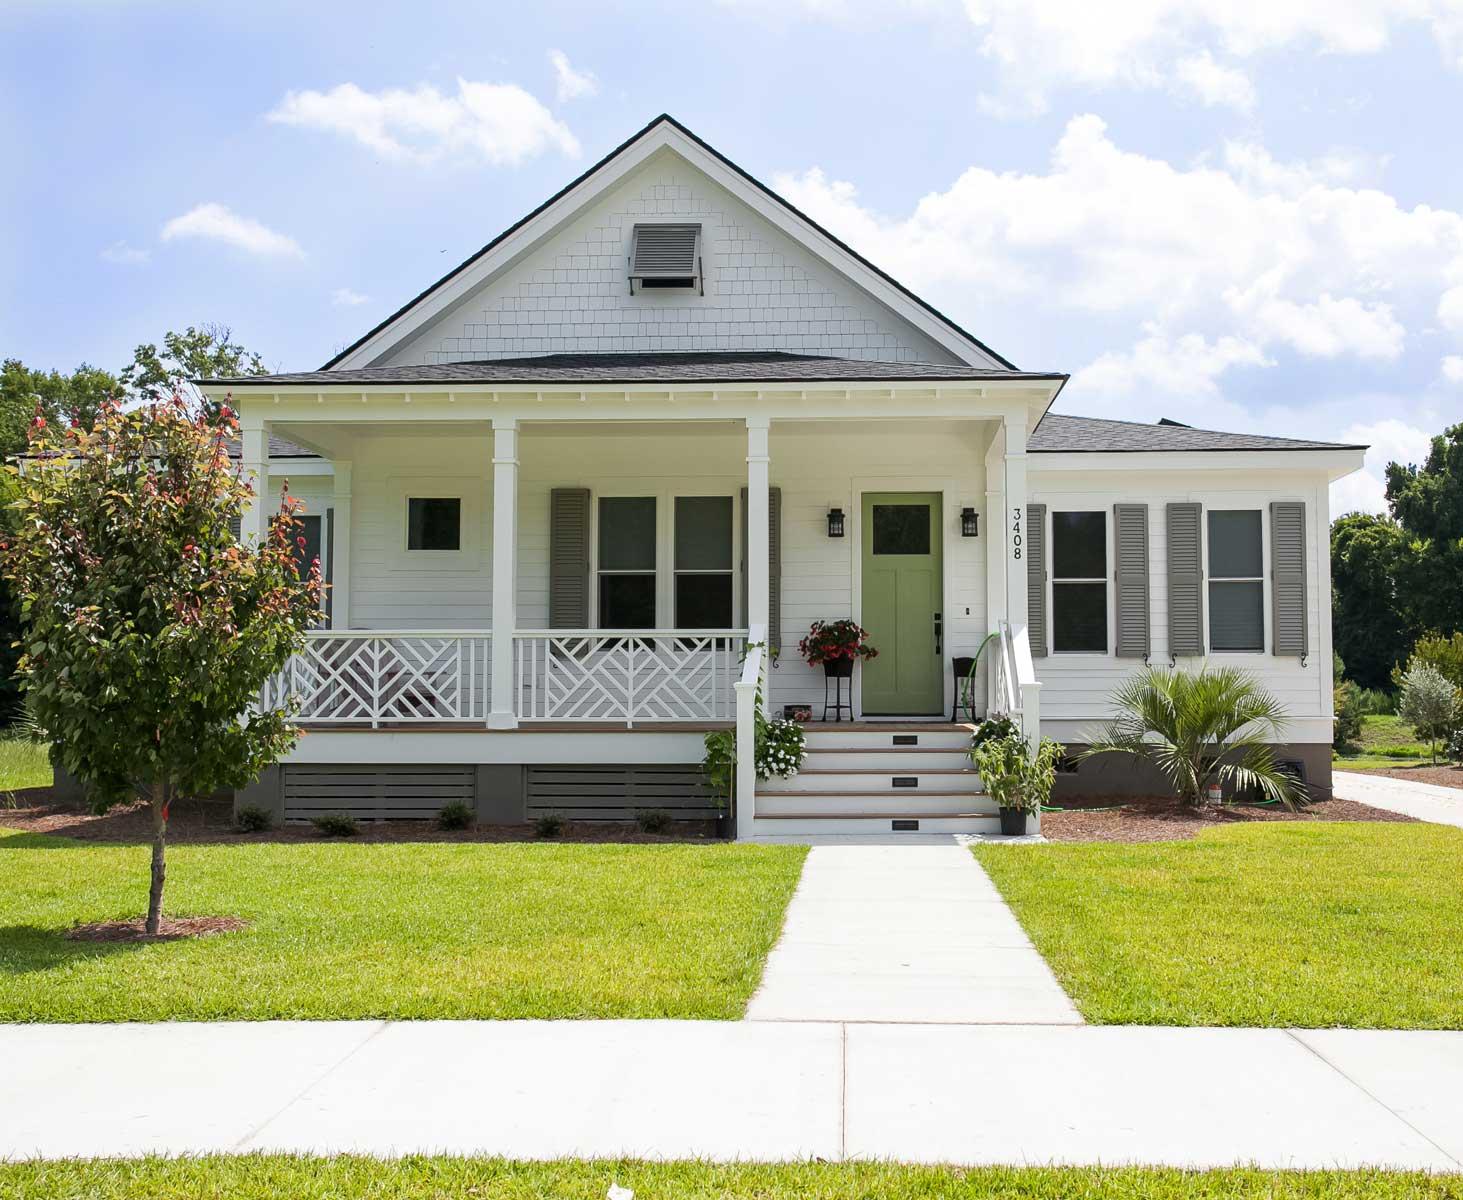 The Charleston Lowcountry Charm Home